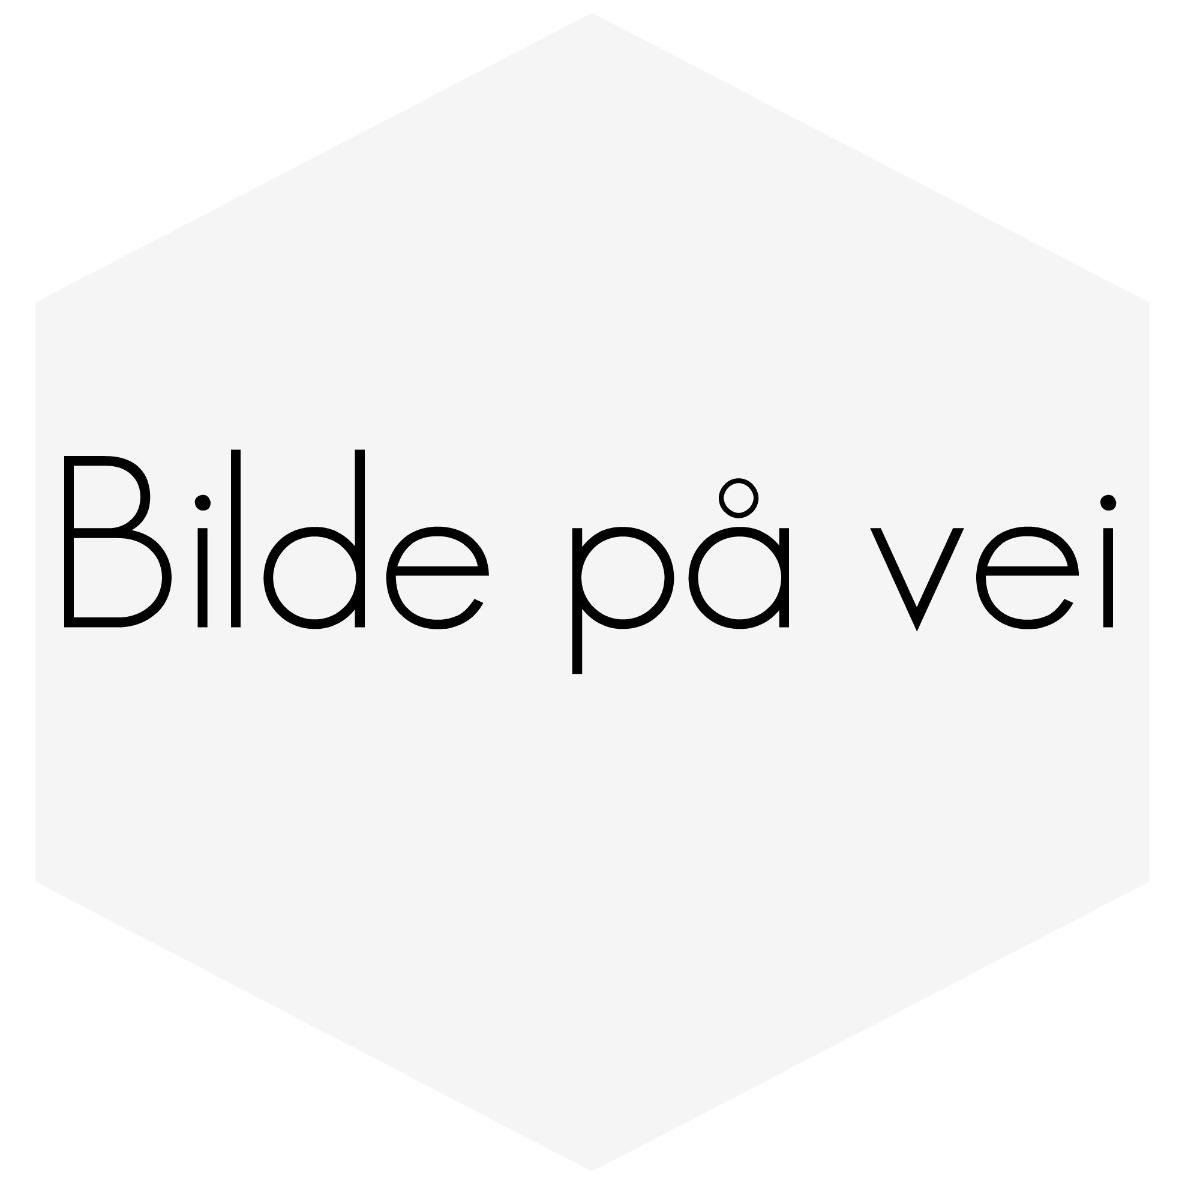 DØRHÅNDTAK UTVENDIG 740/940 HELSORT VENSTRE 6846646